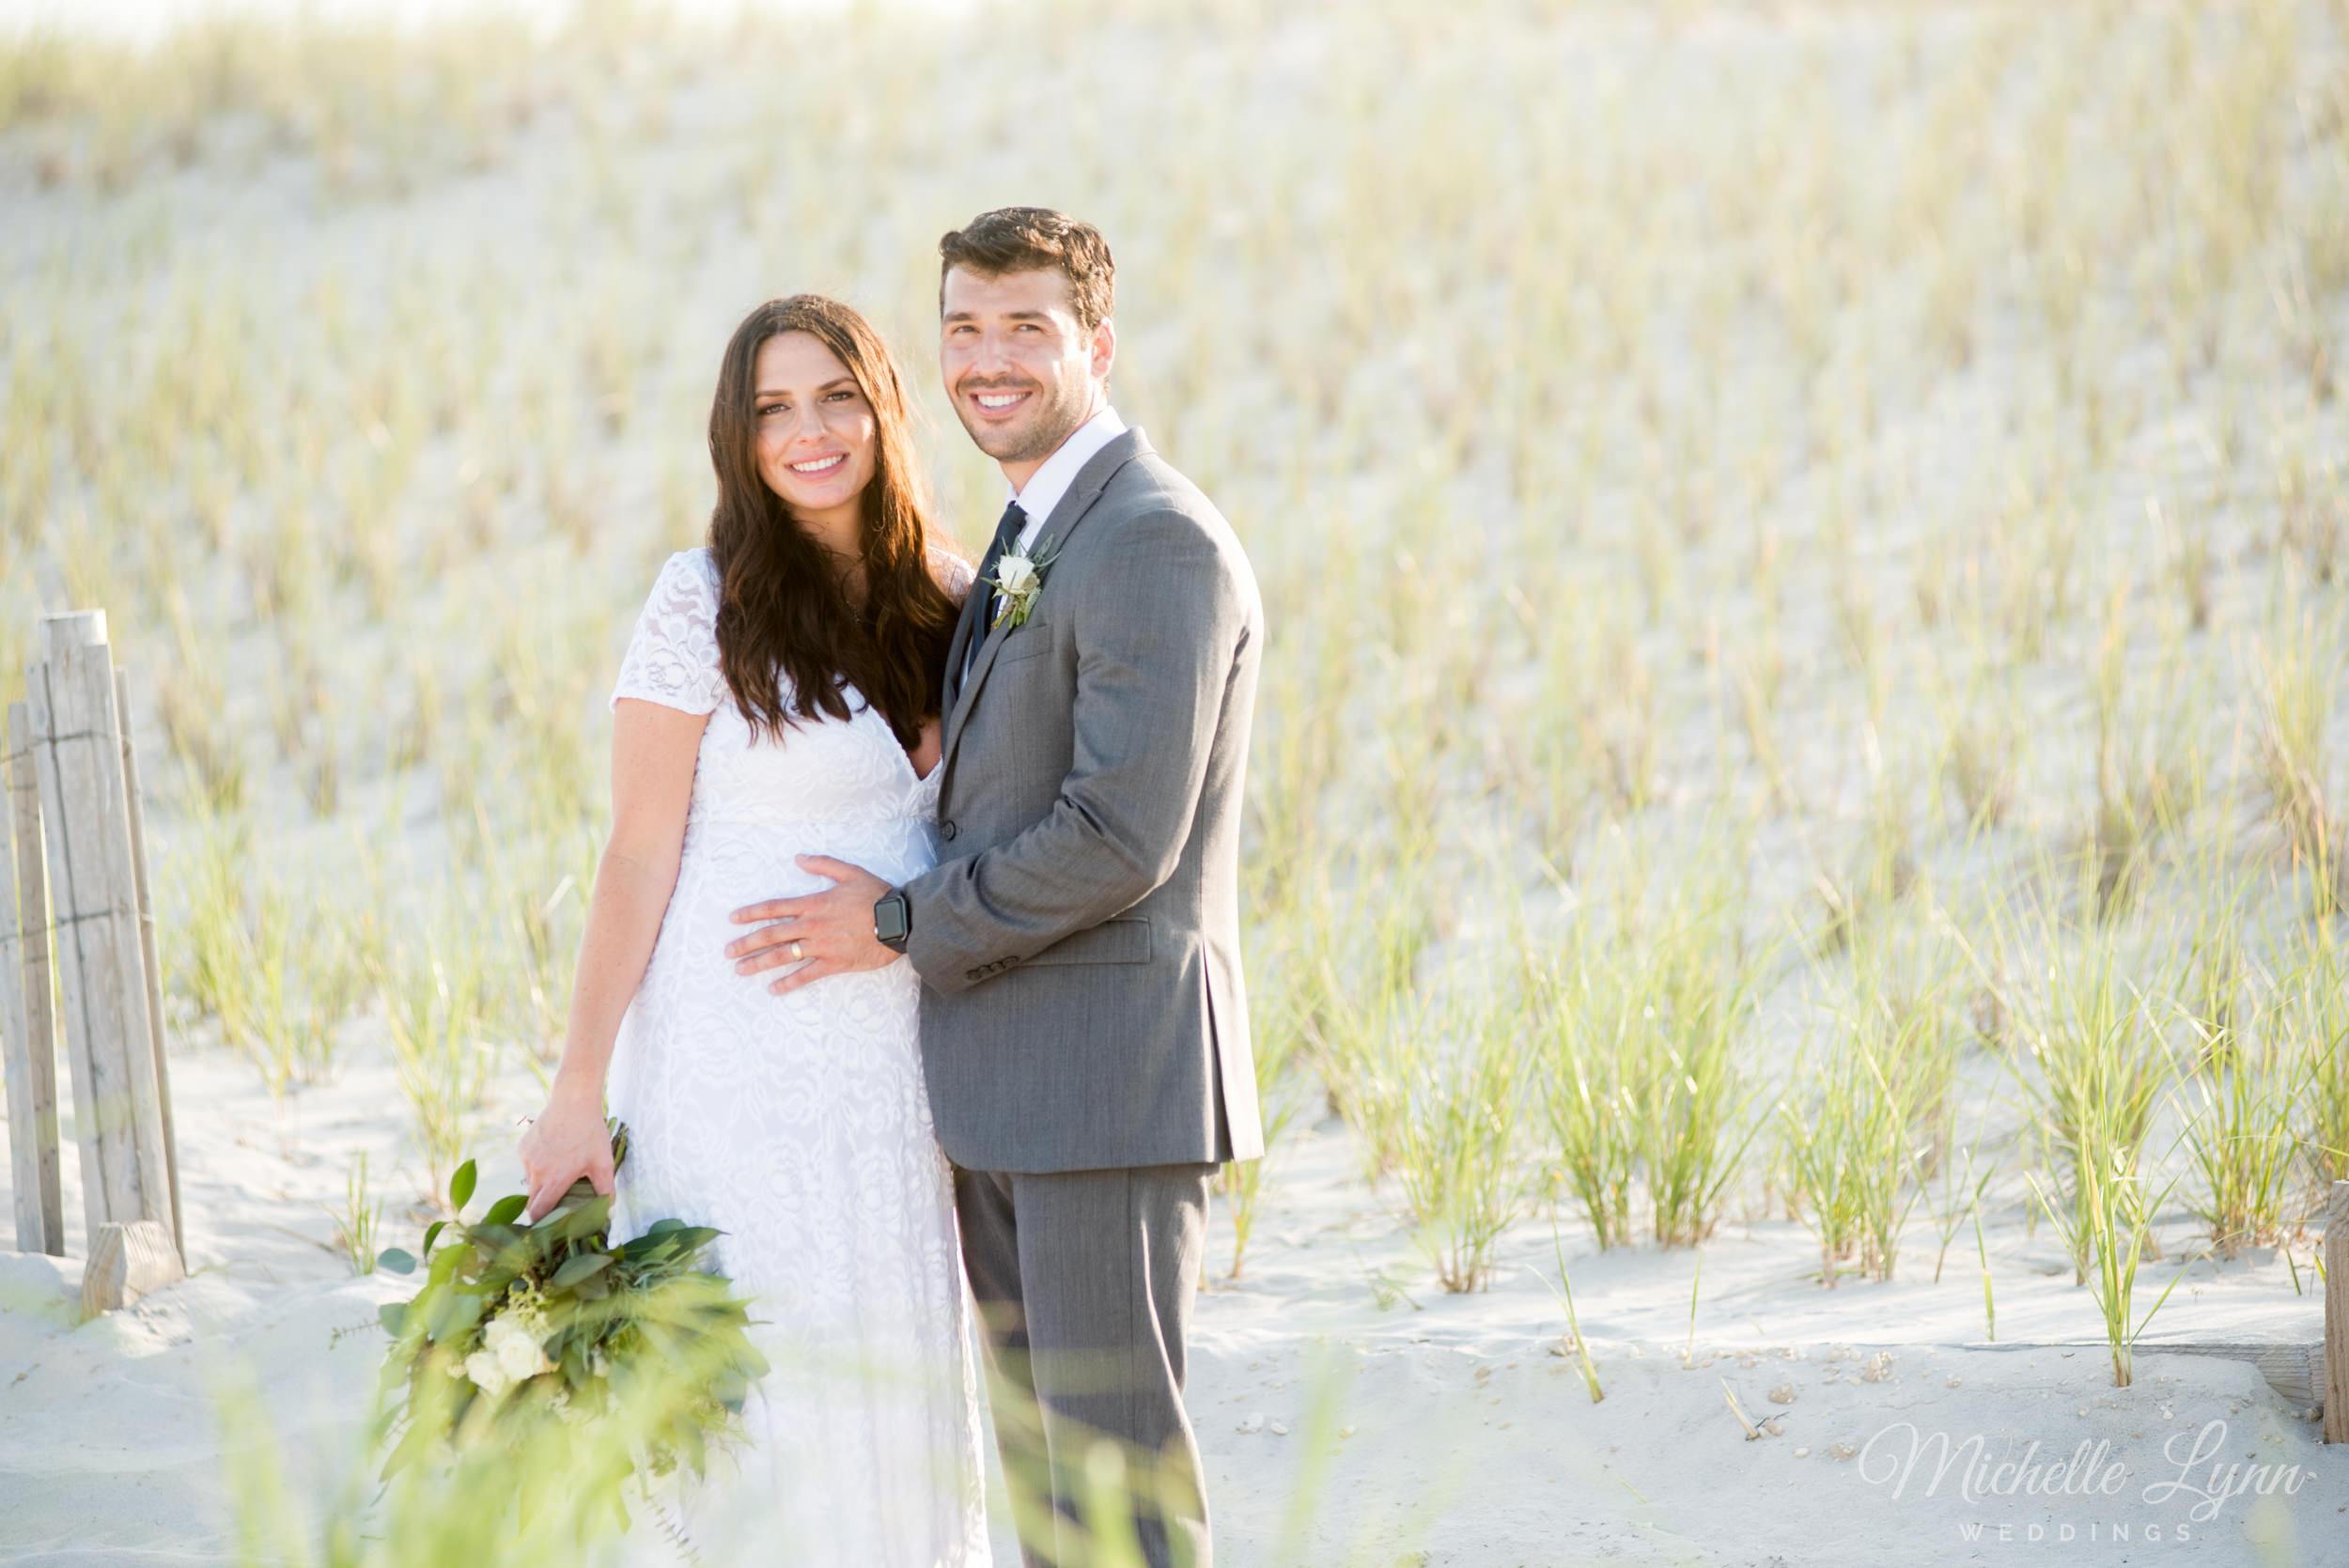 mlw-long-beach-island-new-jersey-wedding-photography-25.jpg